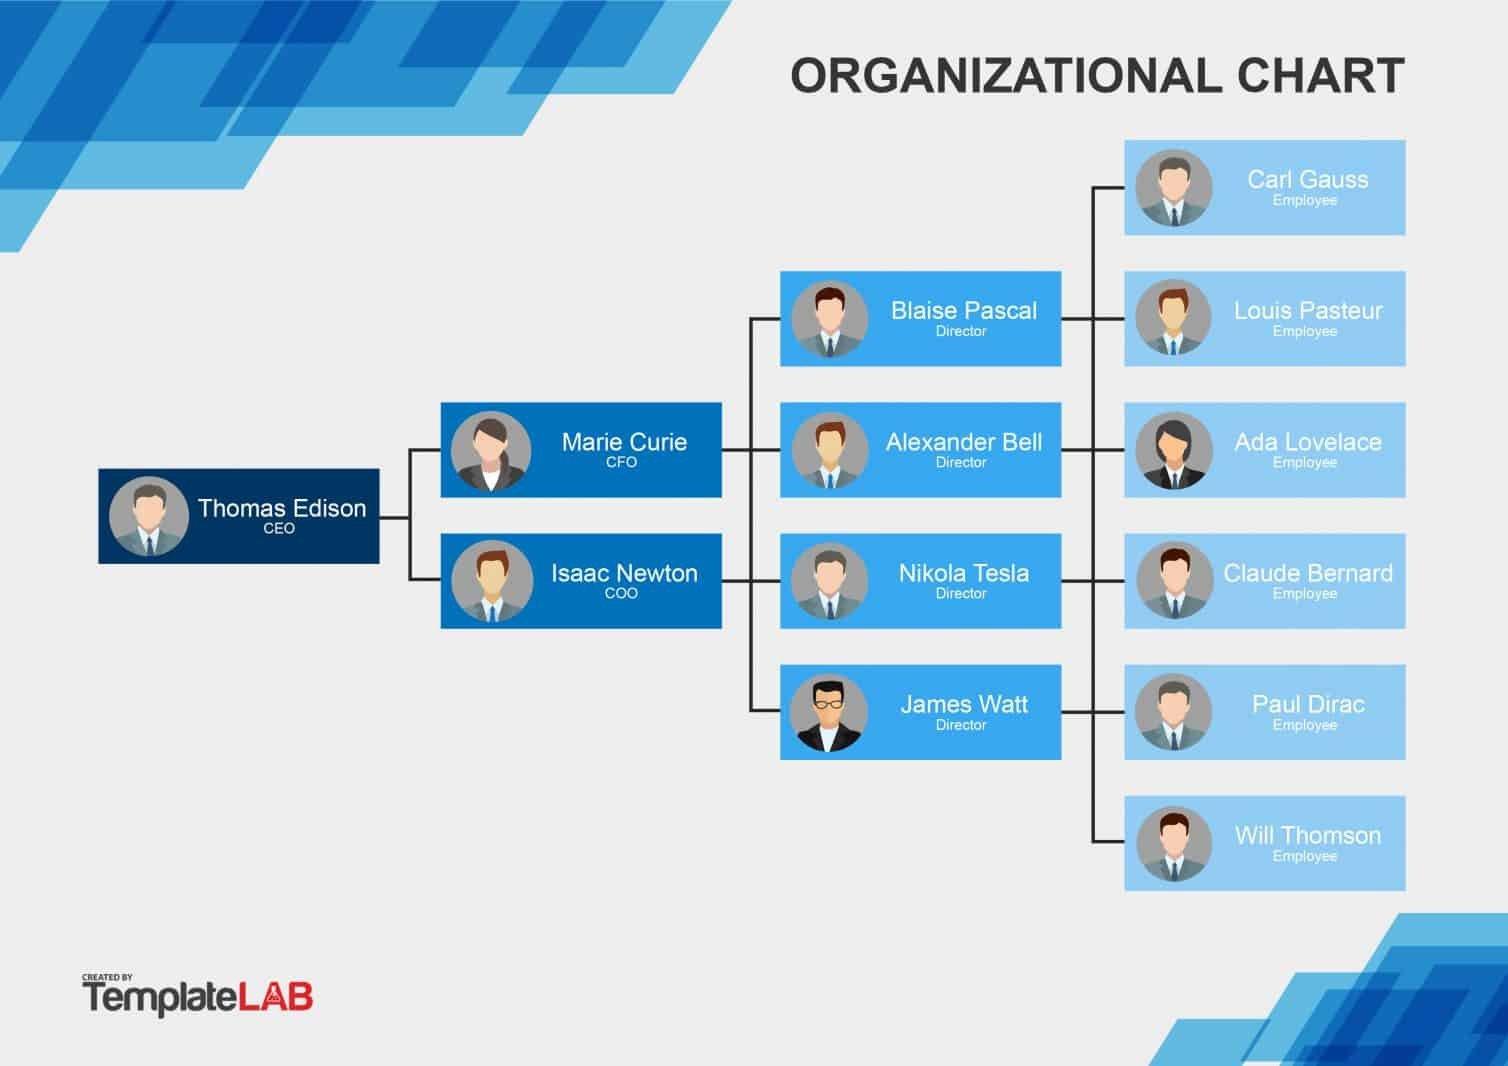 Organizational Chart Template Word 40 organizational Chart Templates Word Excel Powerpoint